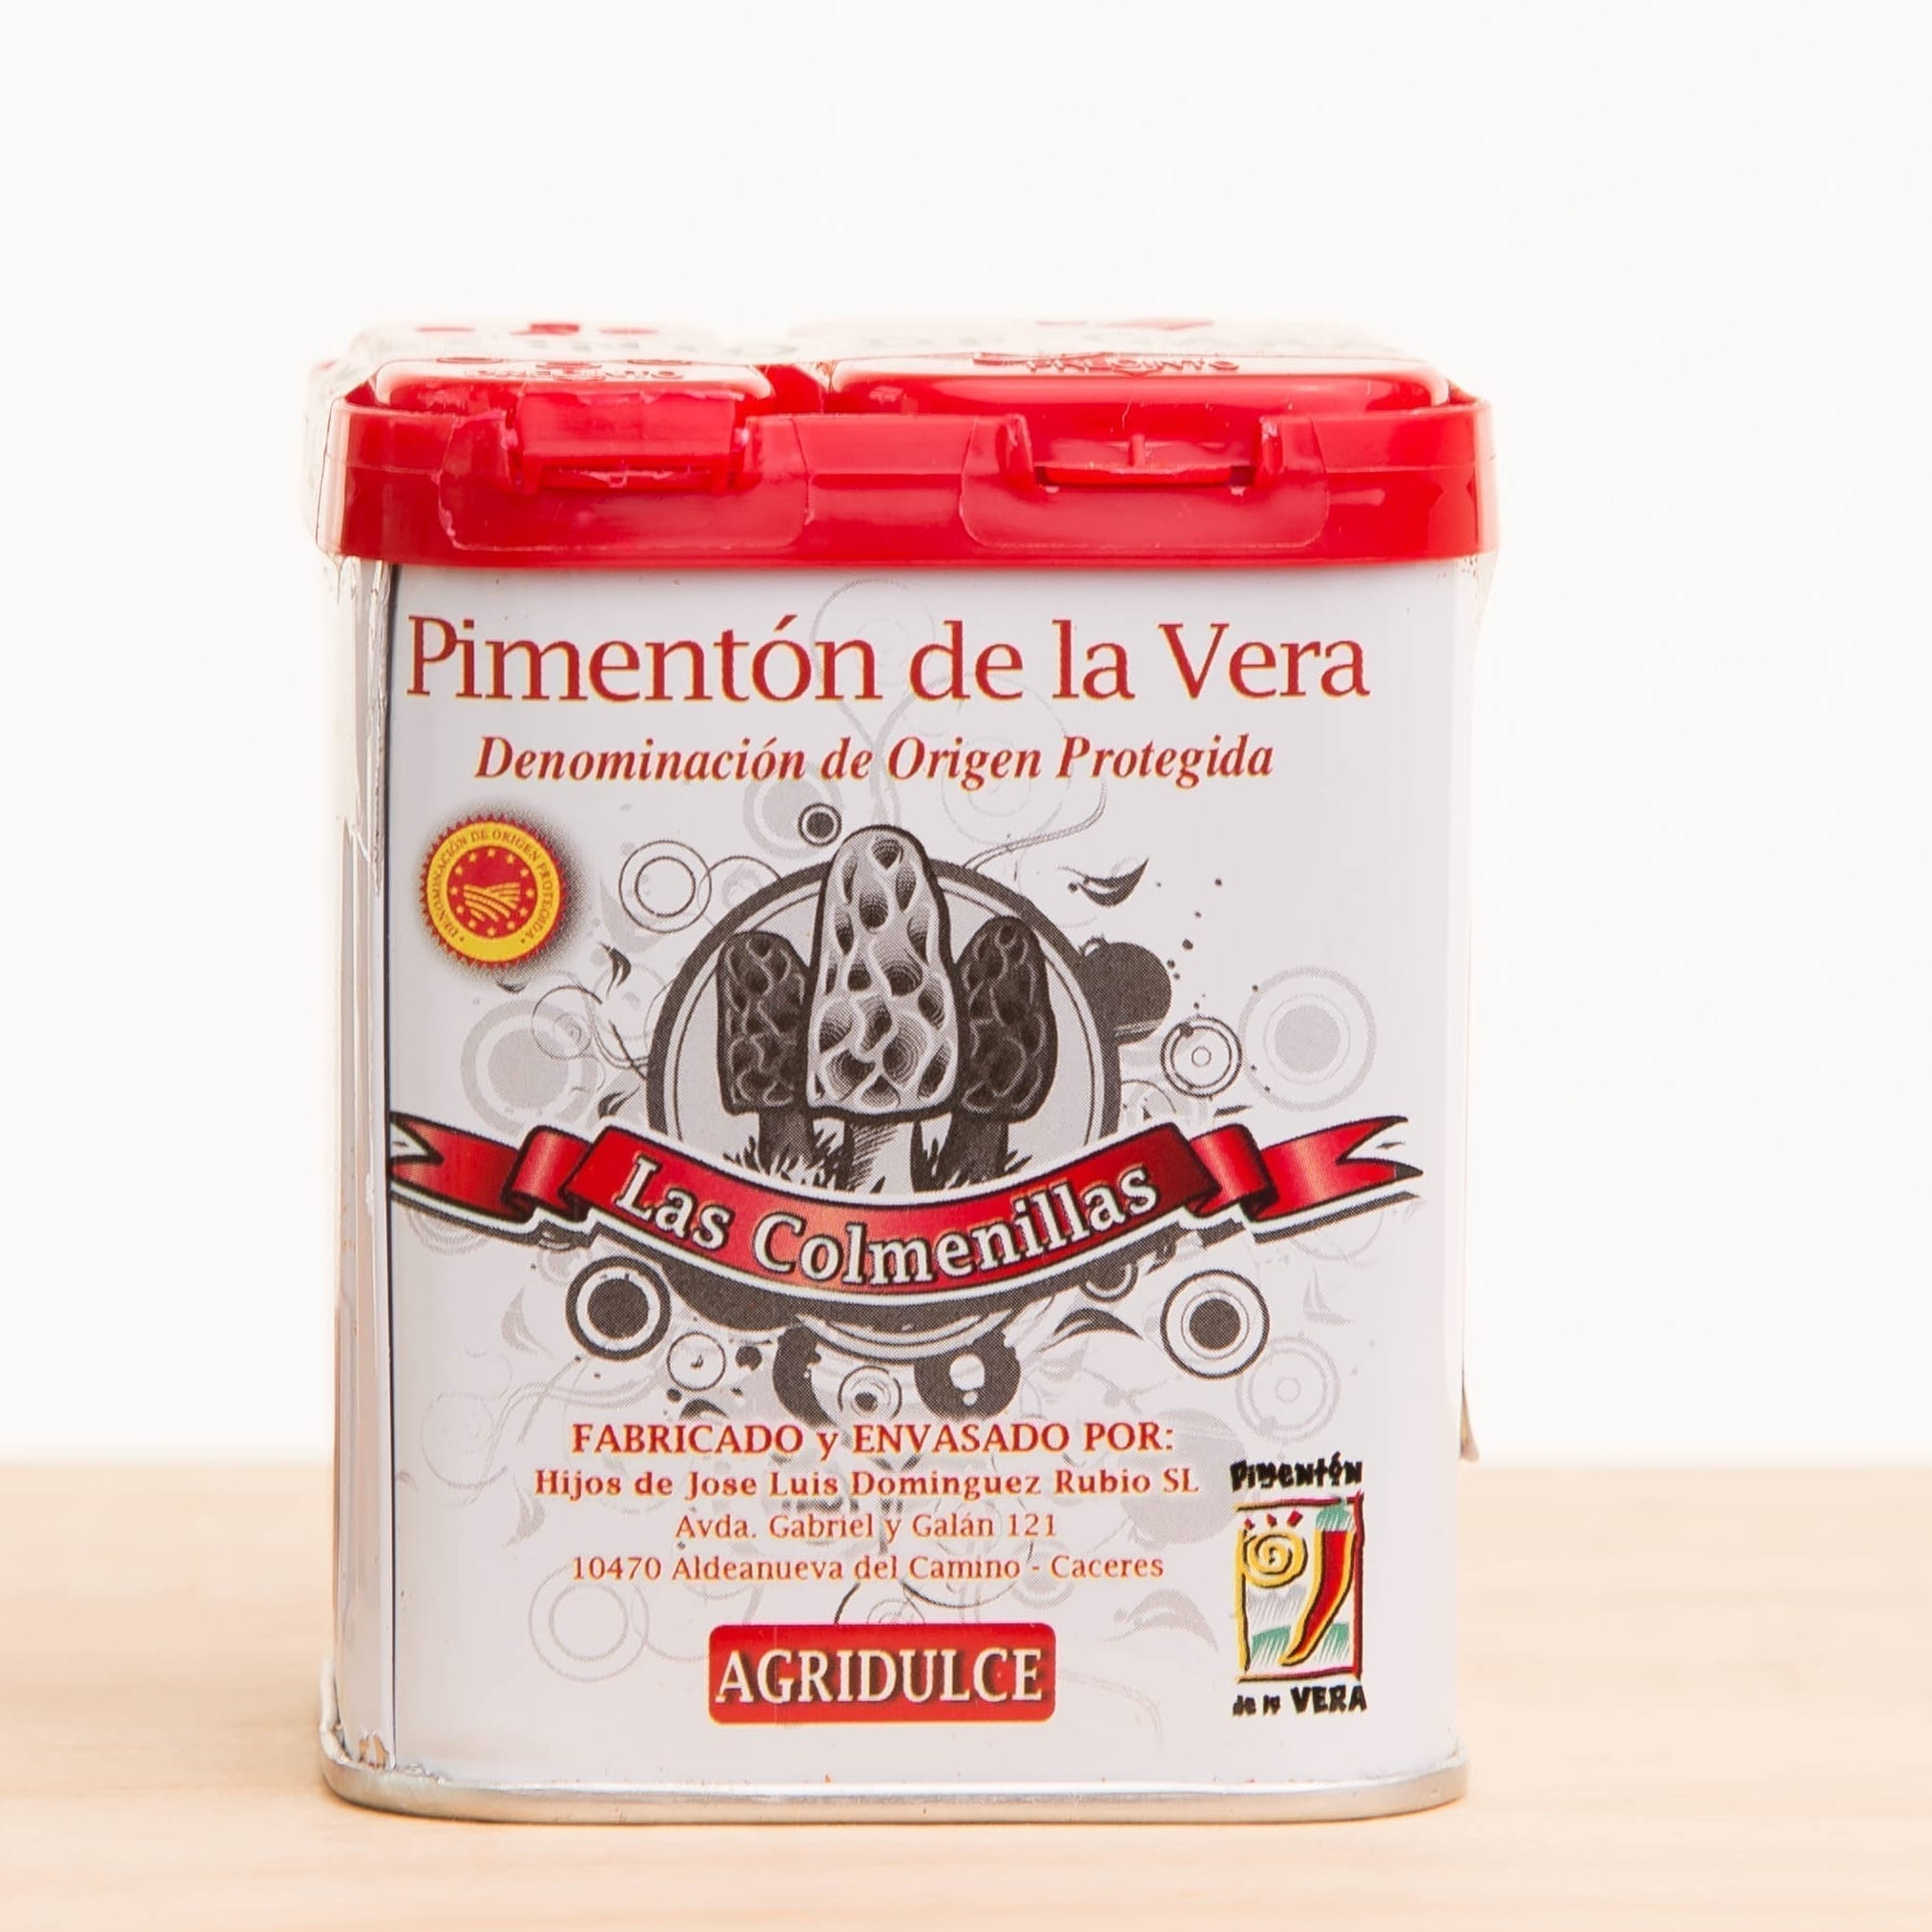 Paprika De La Vera - Agridulce (Bitter/Sweet)